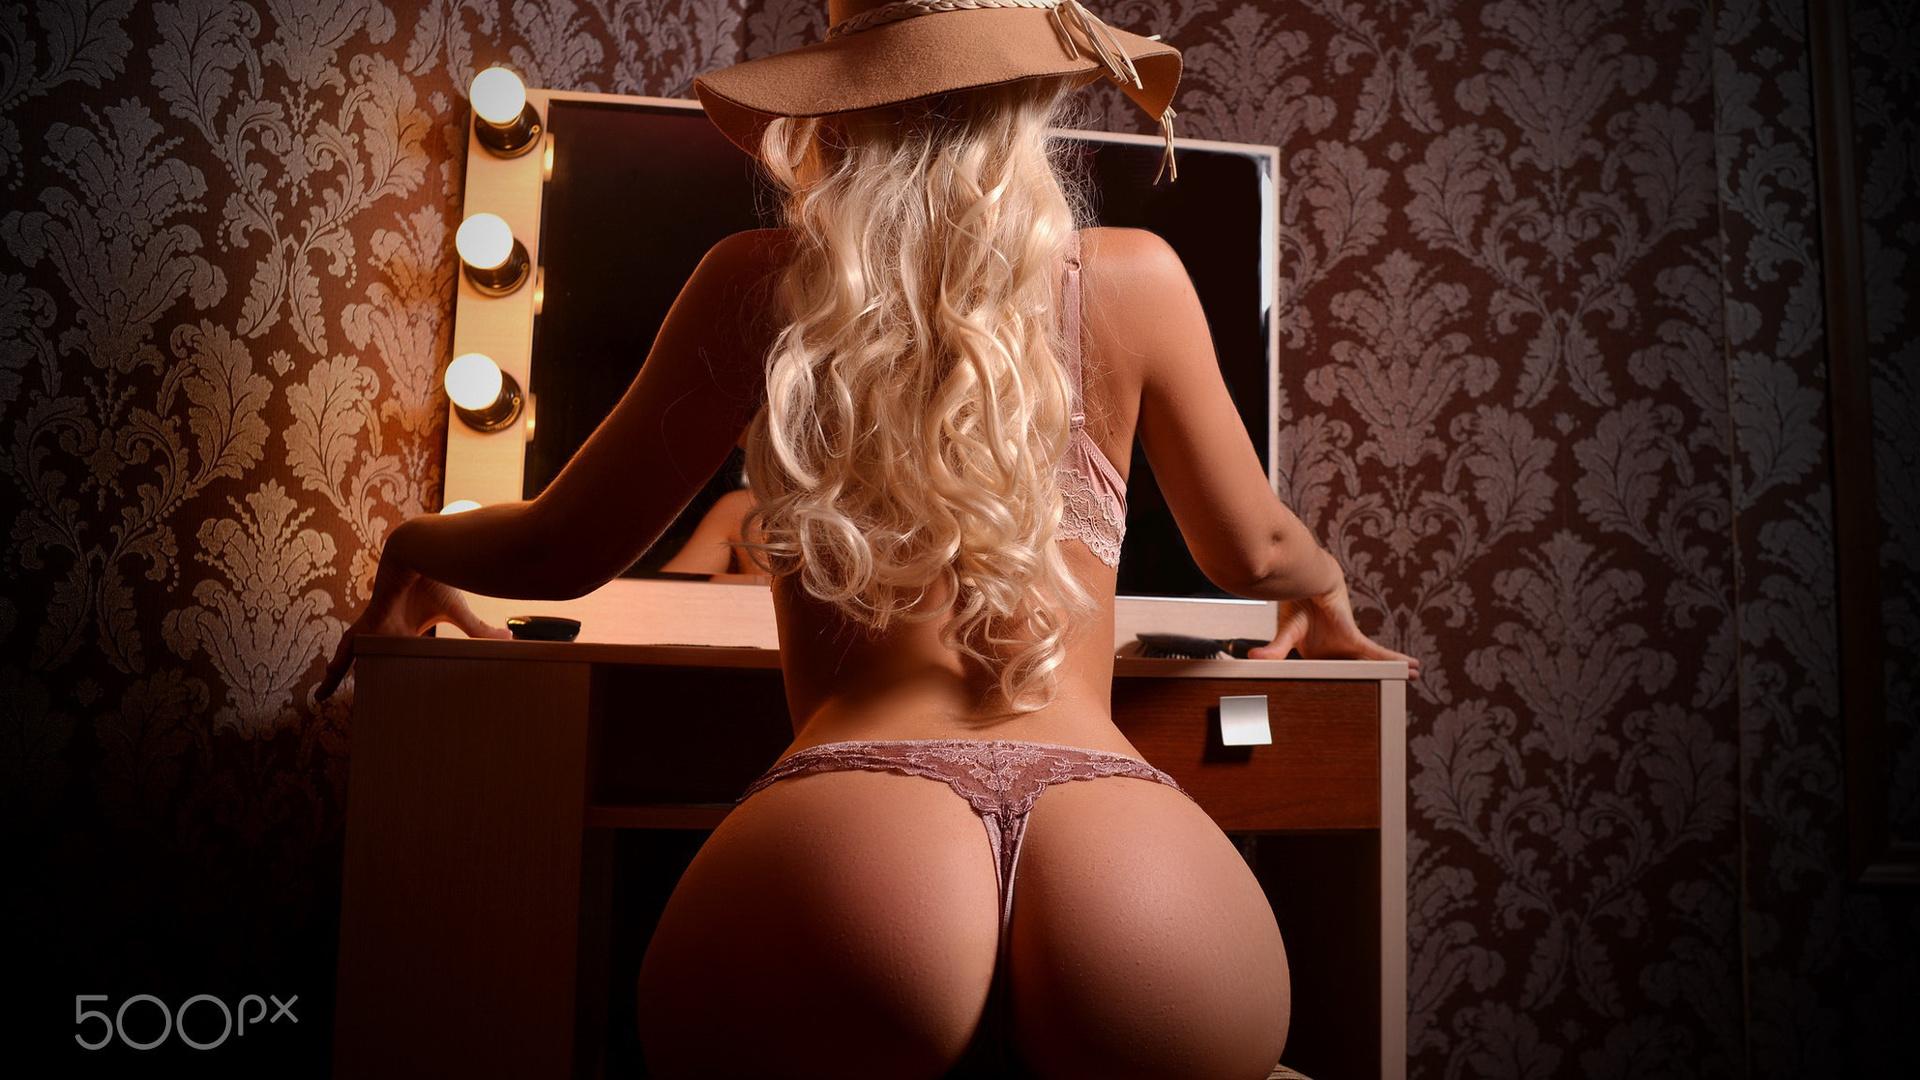 блондинка, поза, бельё, попа, блондинка,сидит,позирует,шляпа,фигурка,попка,сочная,секси,зеркало,фон